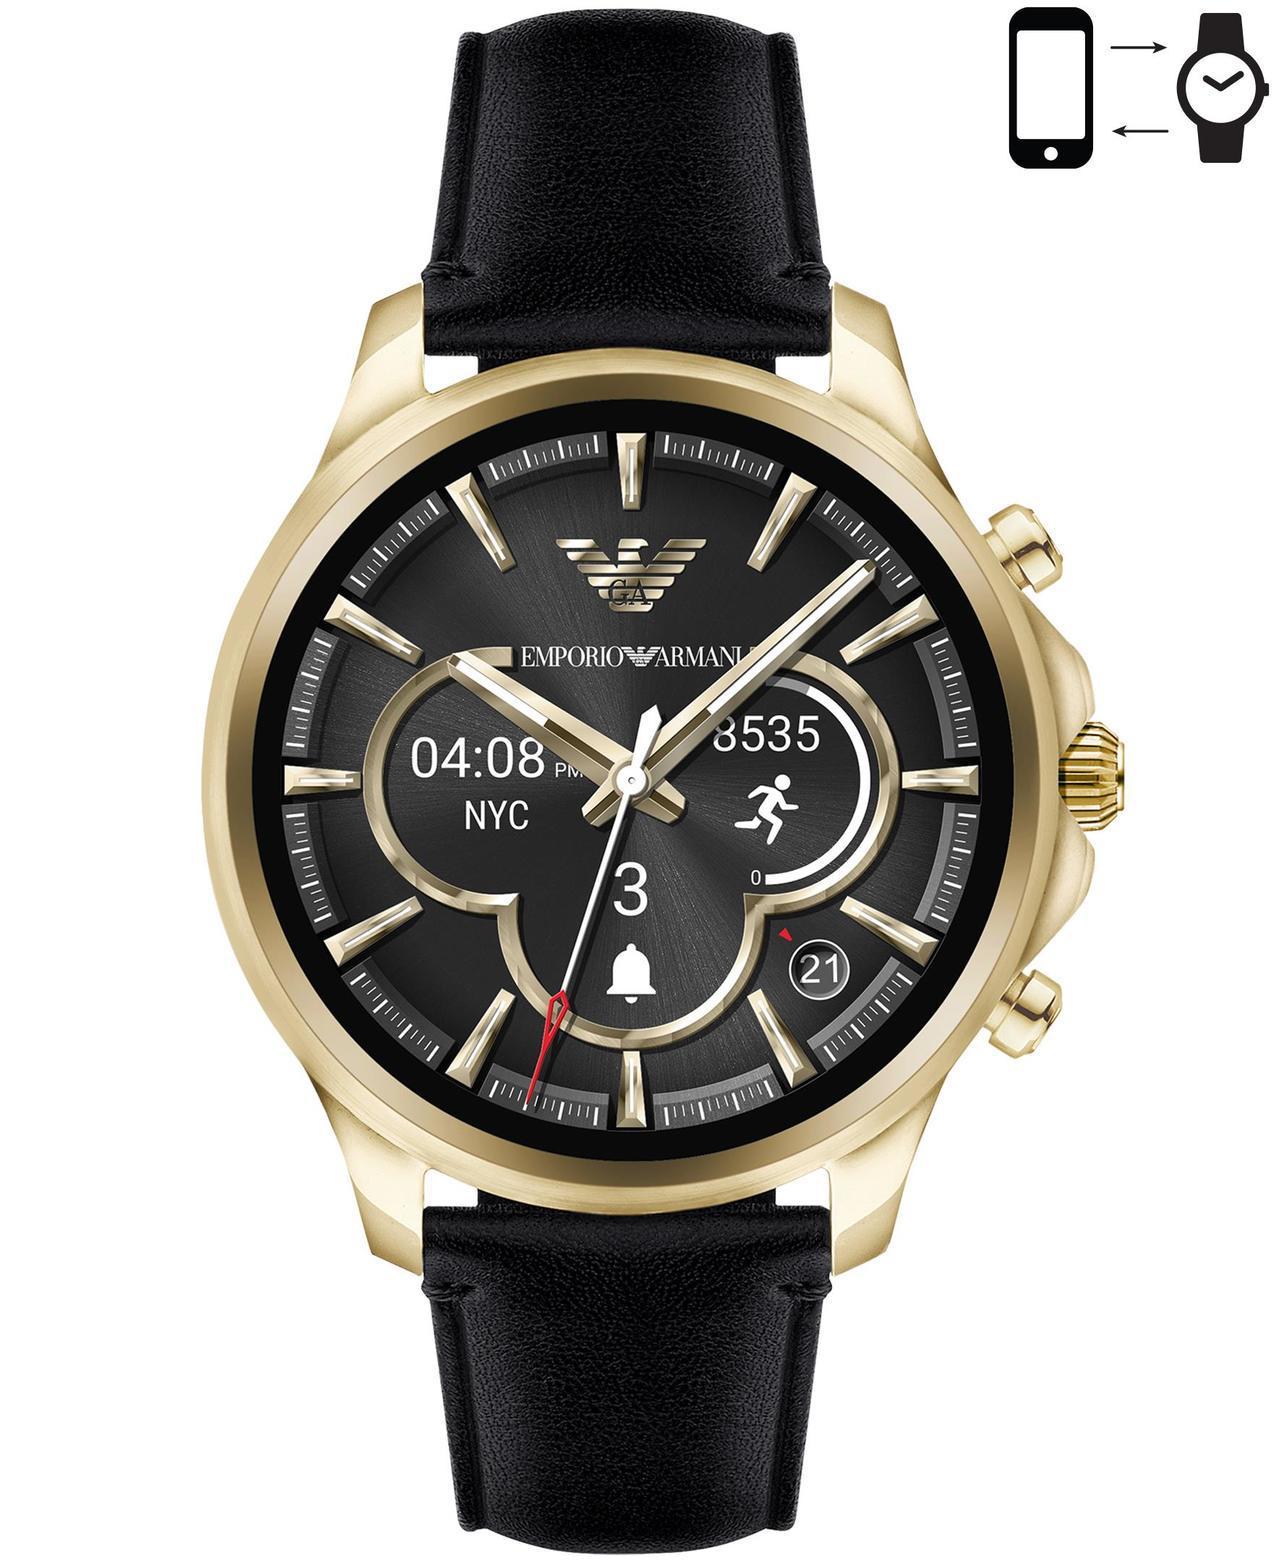 Emporio Armani Alberto系列觸控式螢幕智能、腕表,金色表殼搭...